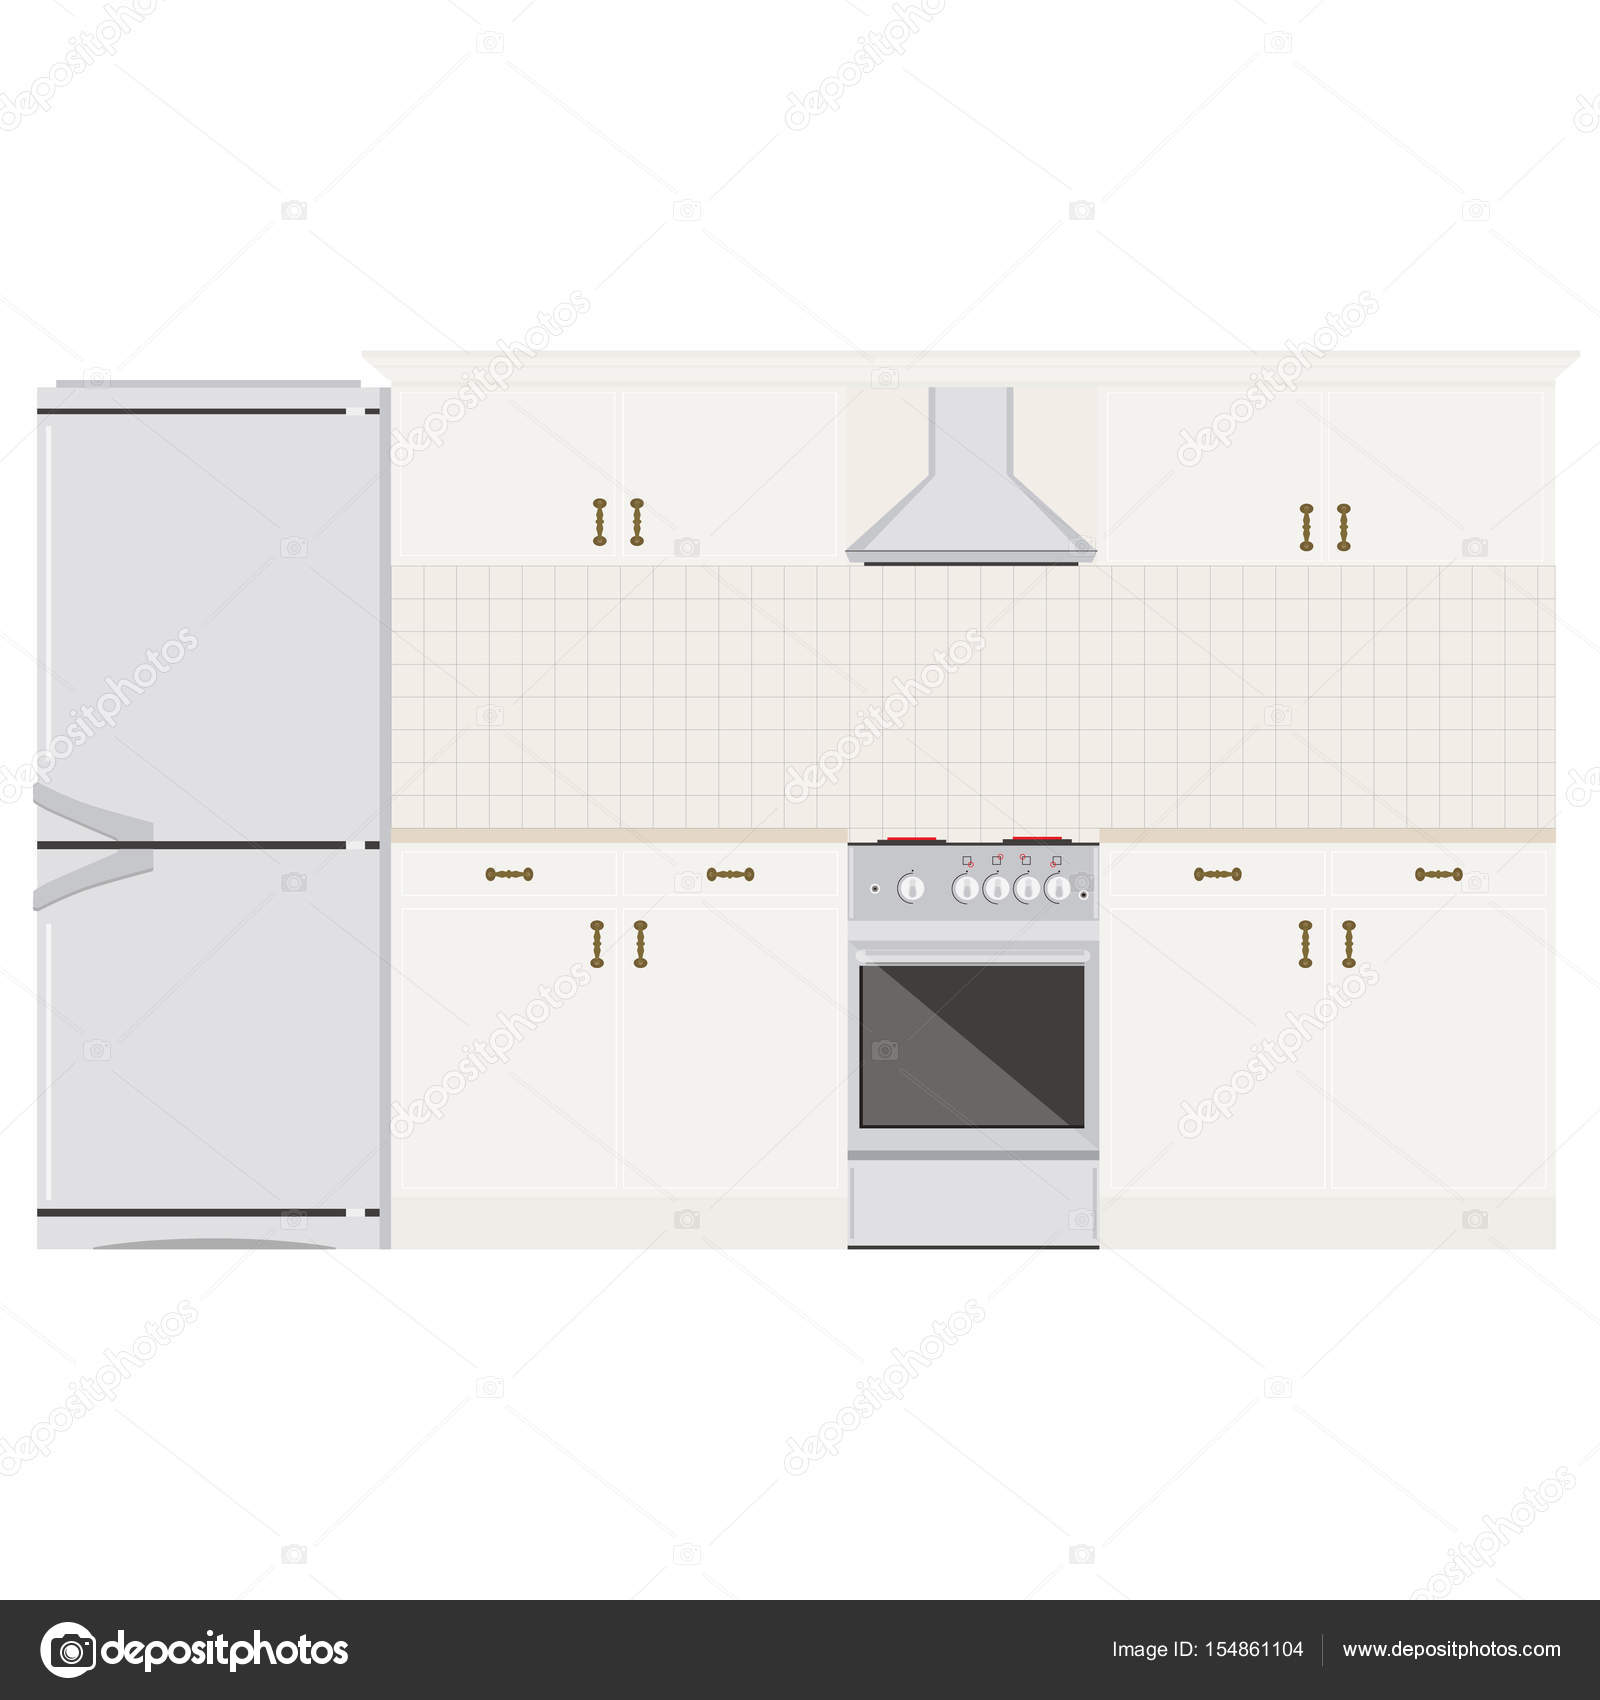 Cocina sala raster — Foto de stock © viktorijareut #154861104